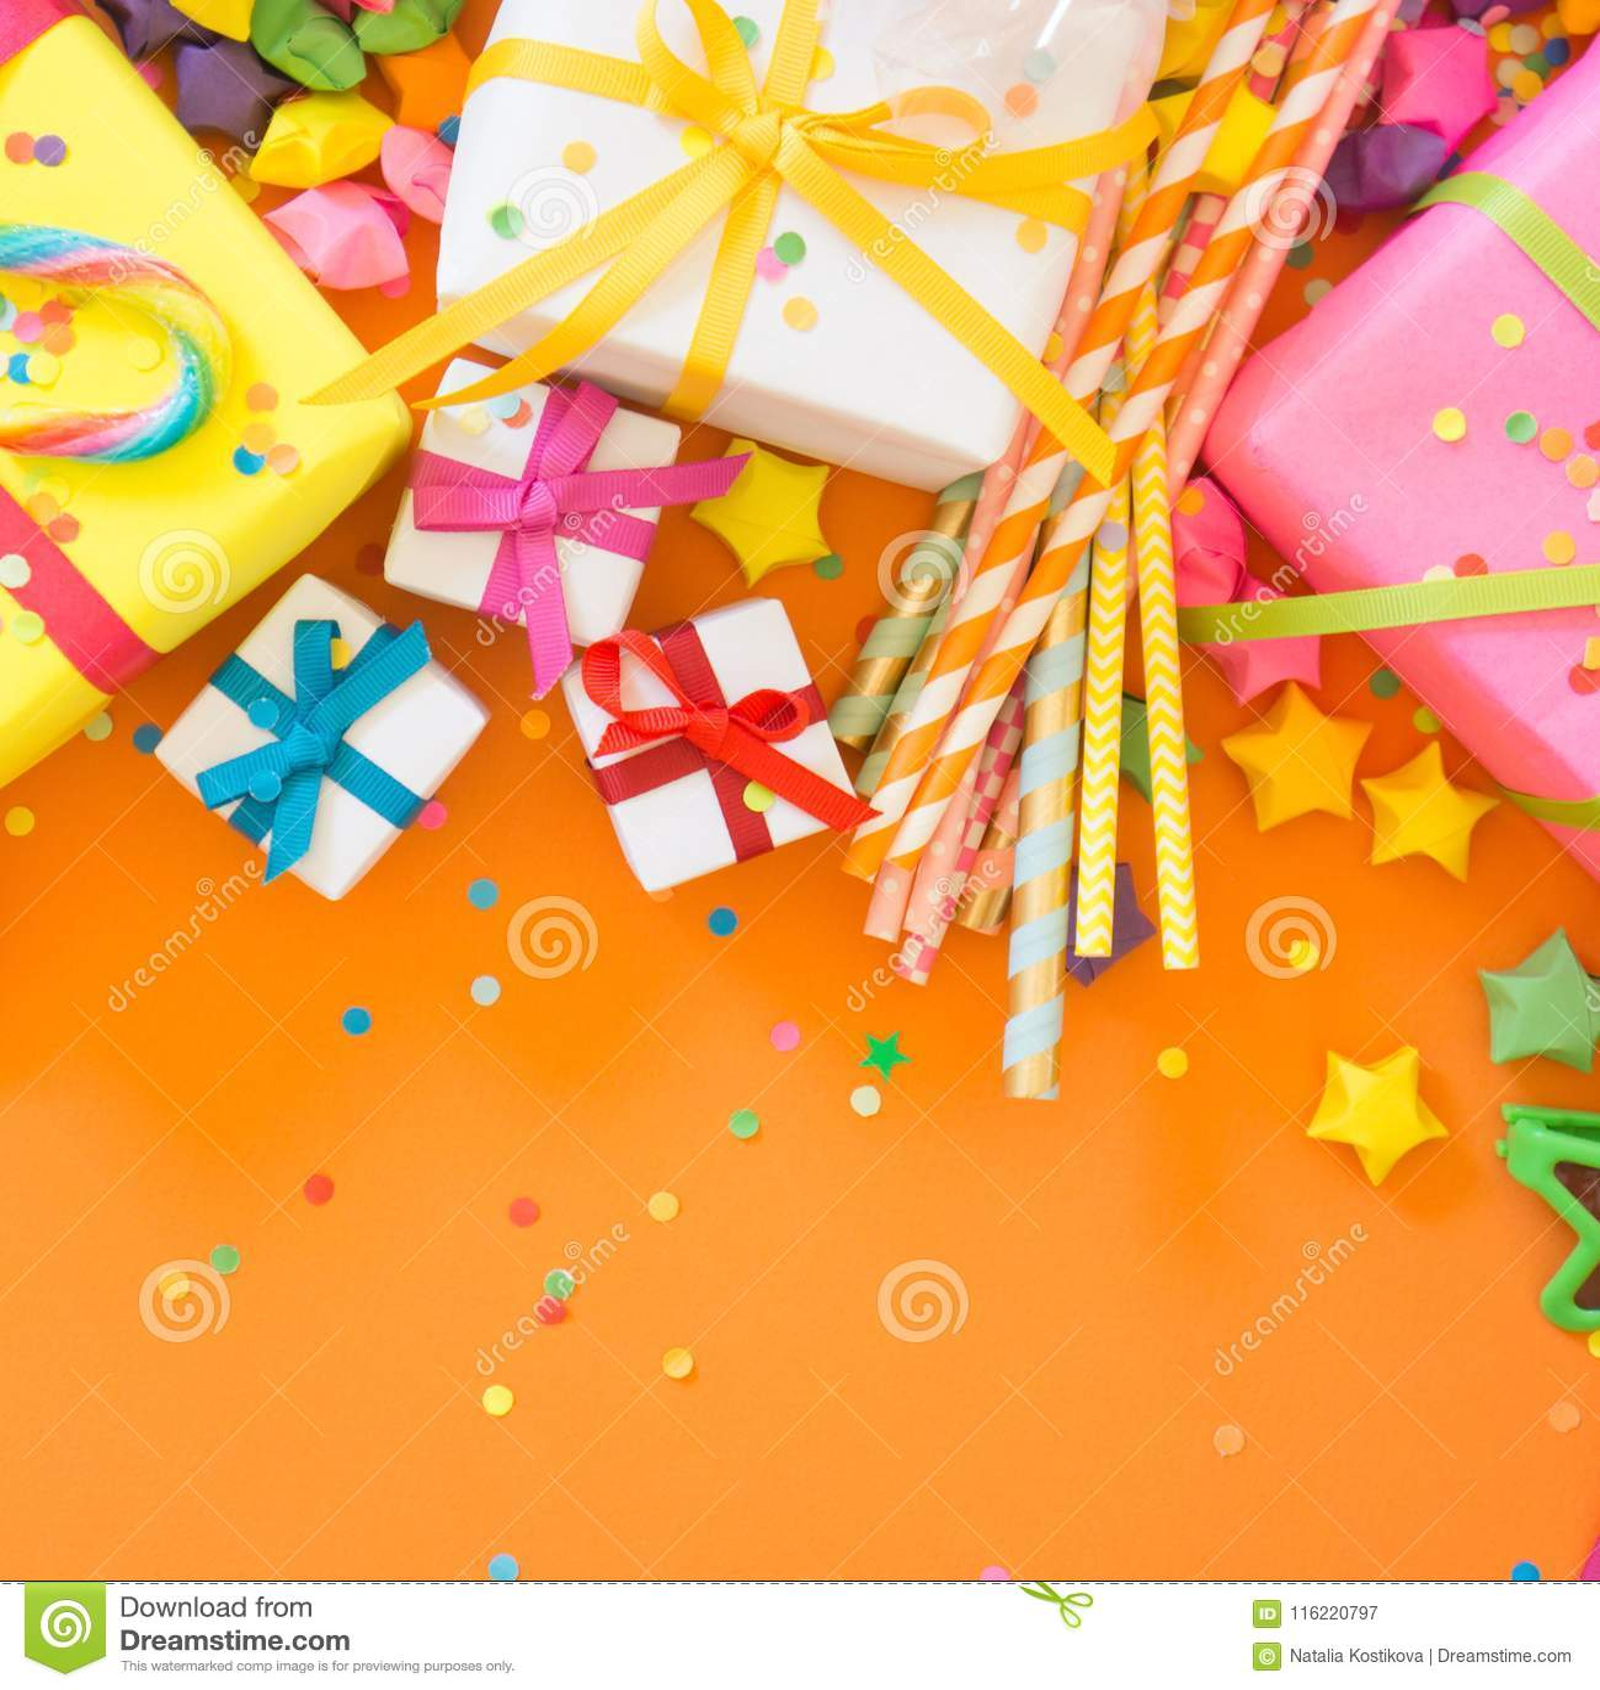 birthday gift gif download